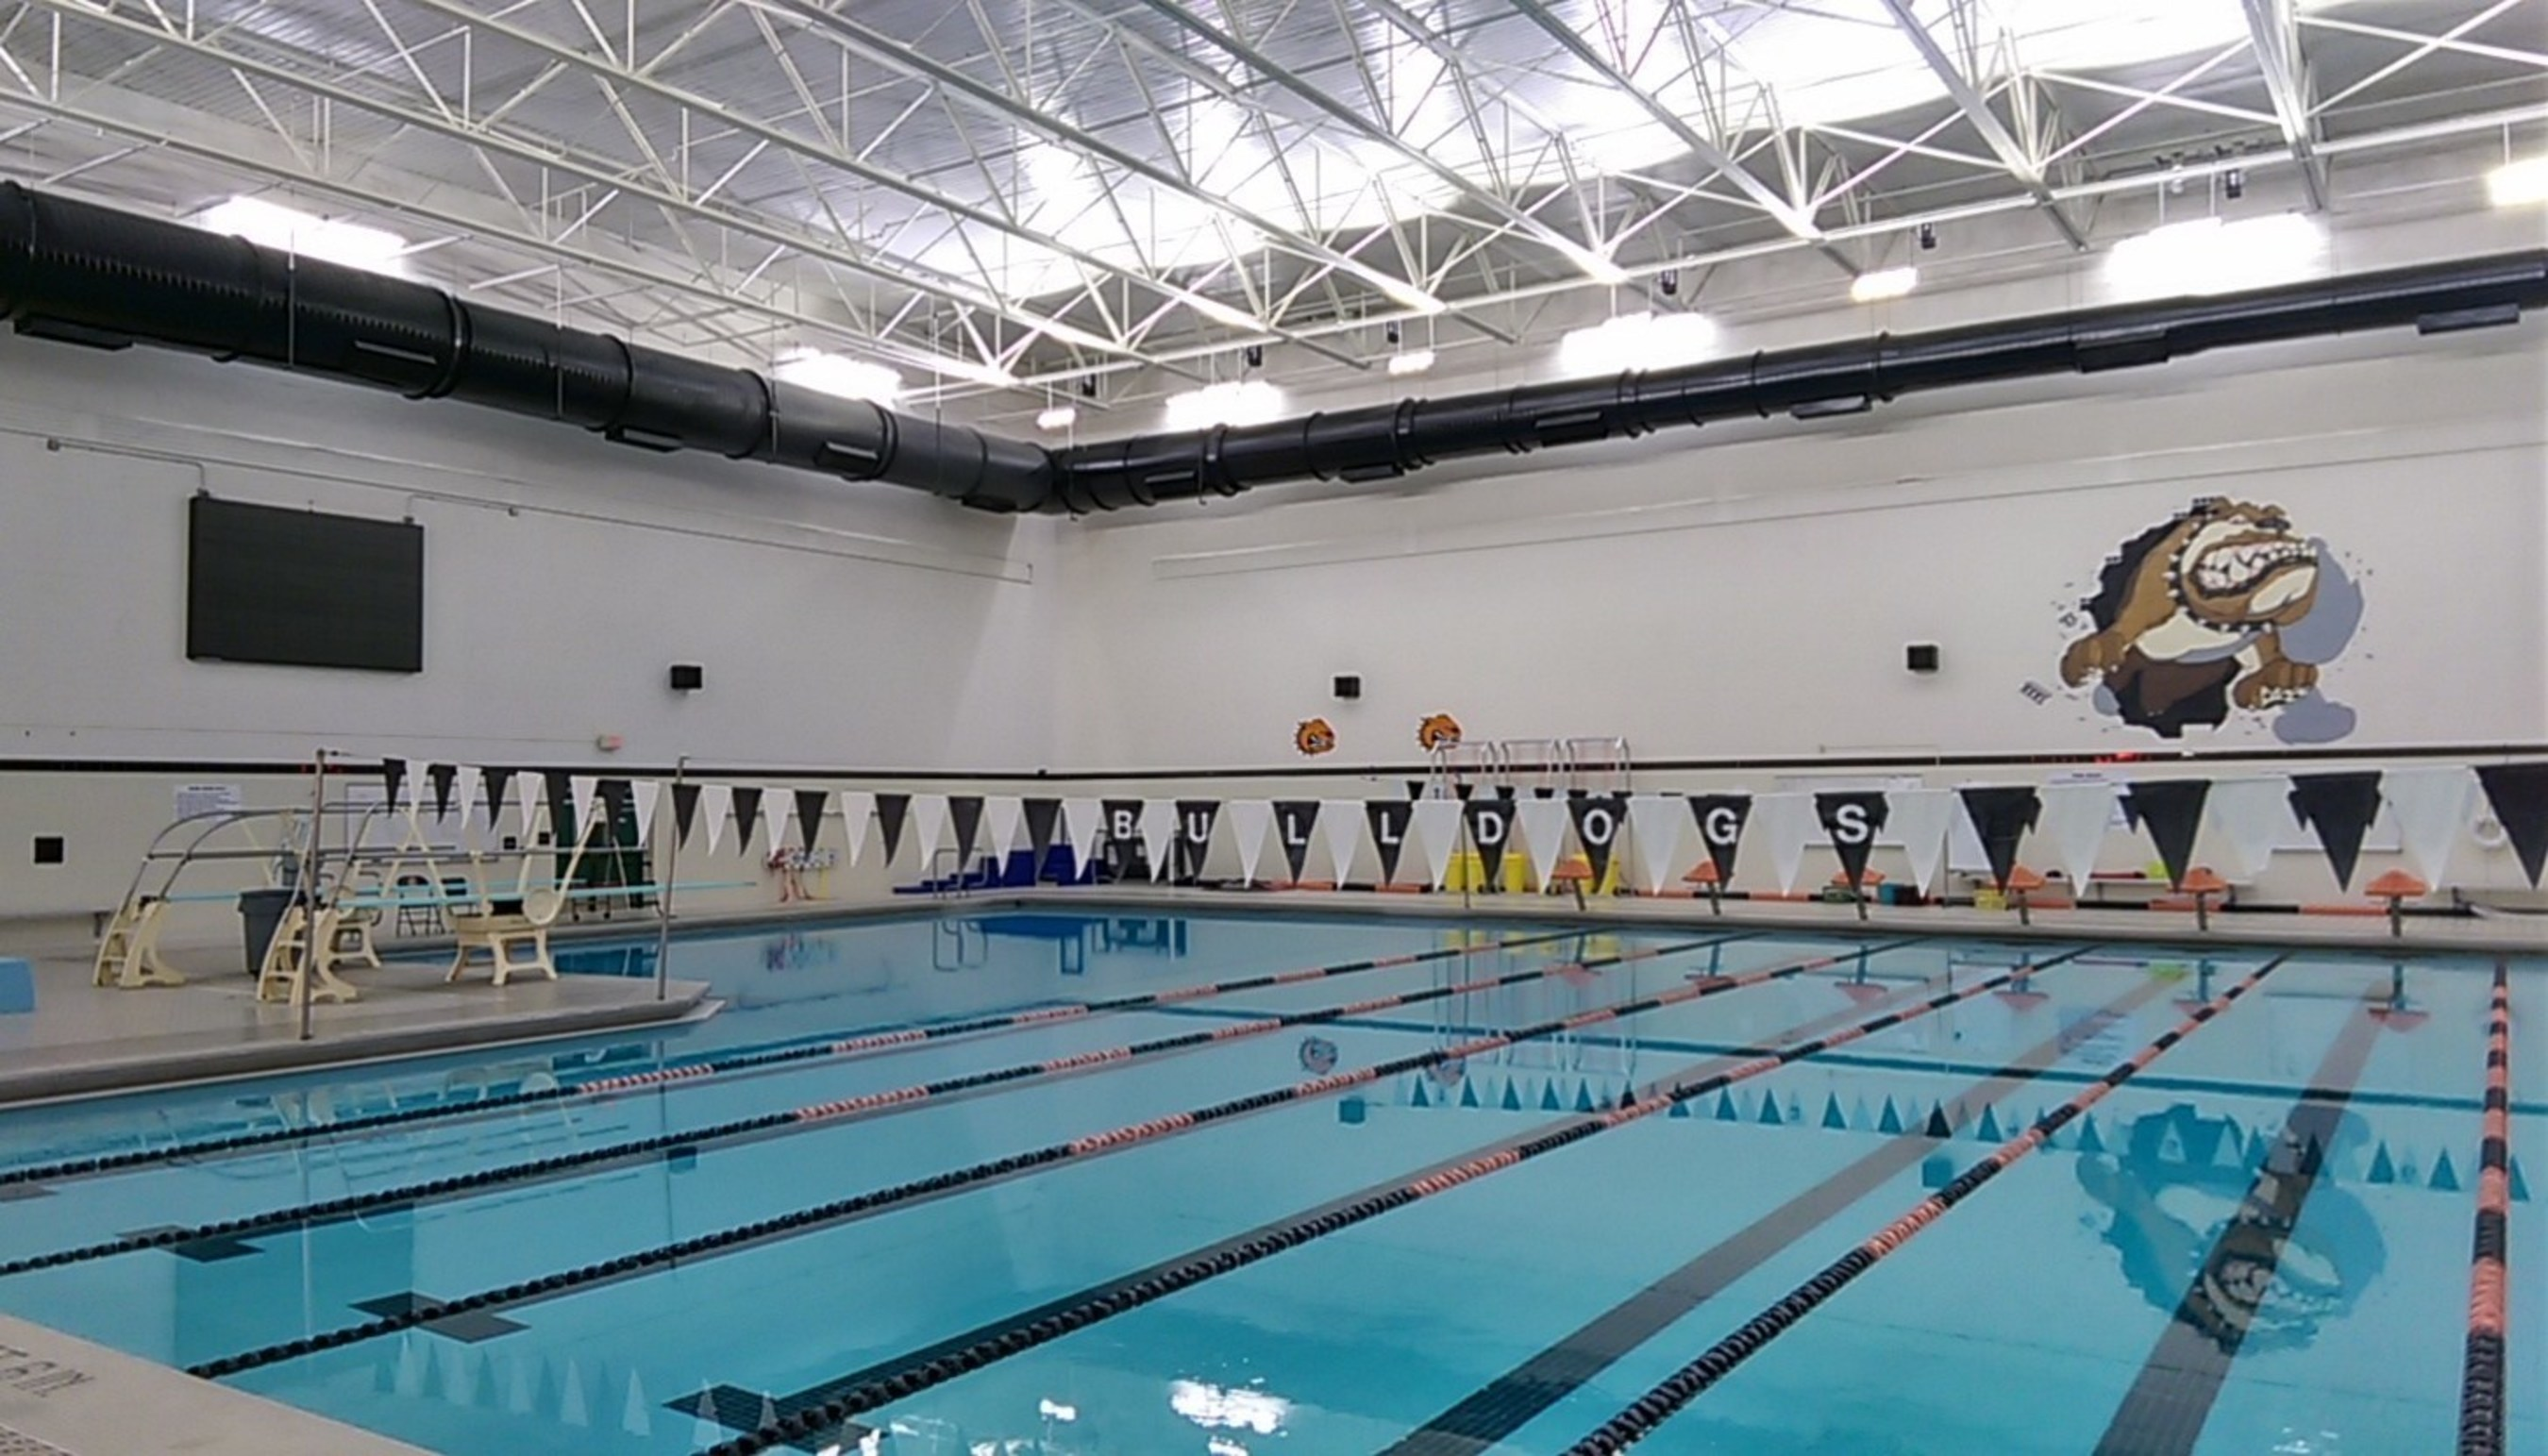 Byron Center High School Aquatic Center